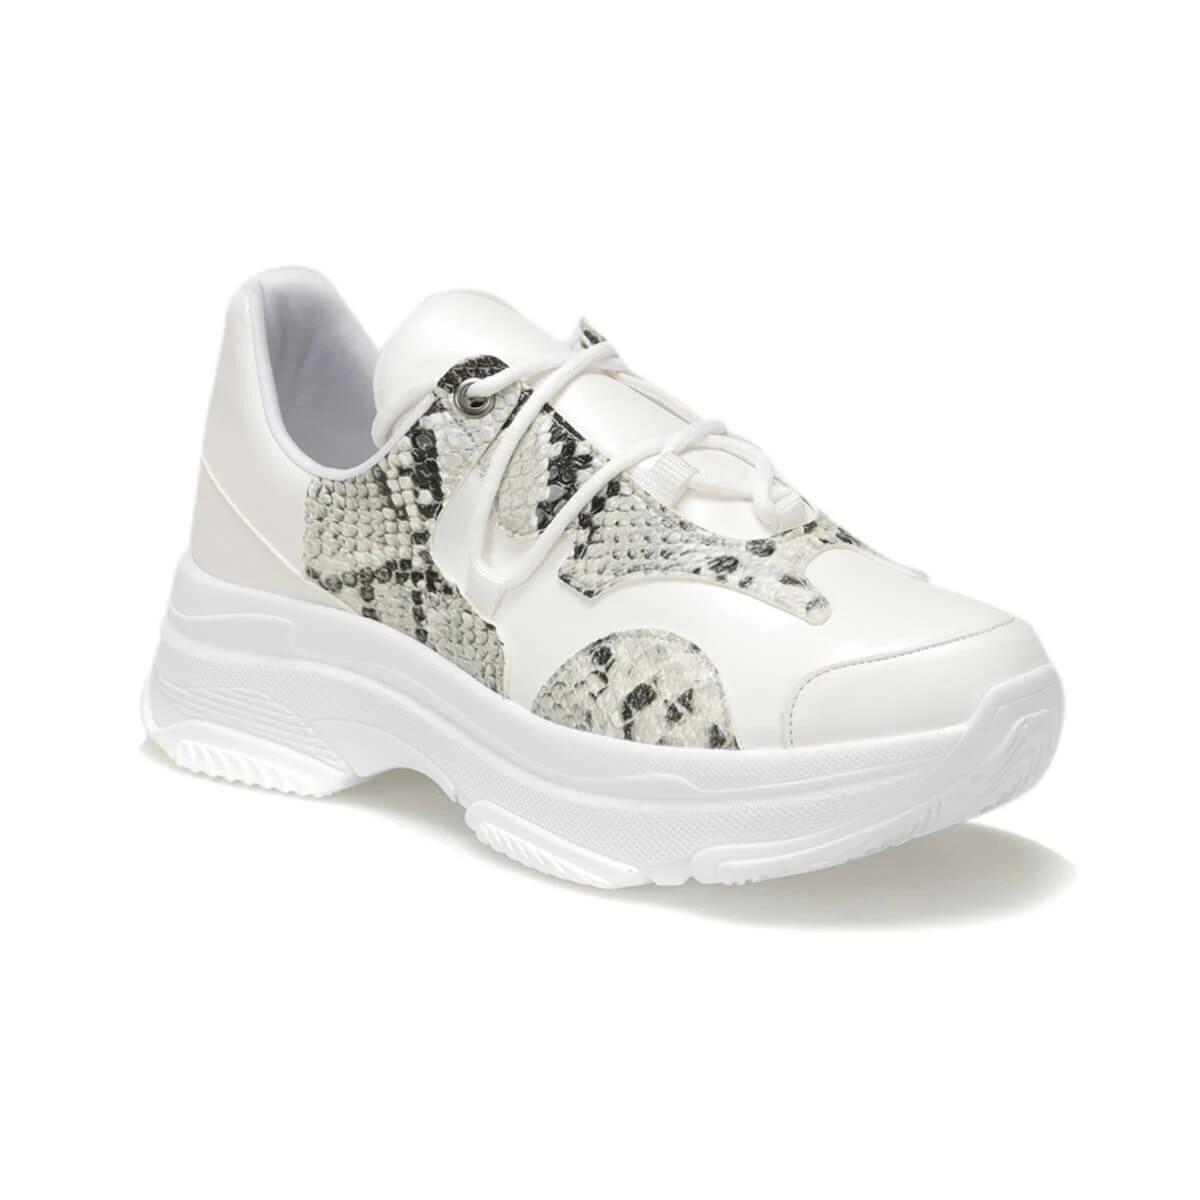 FLO TECNA01Z SKIN White Women 'S Sneaker Shoes BUTIGO